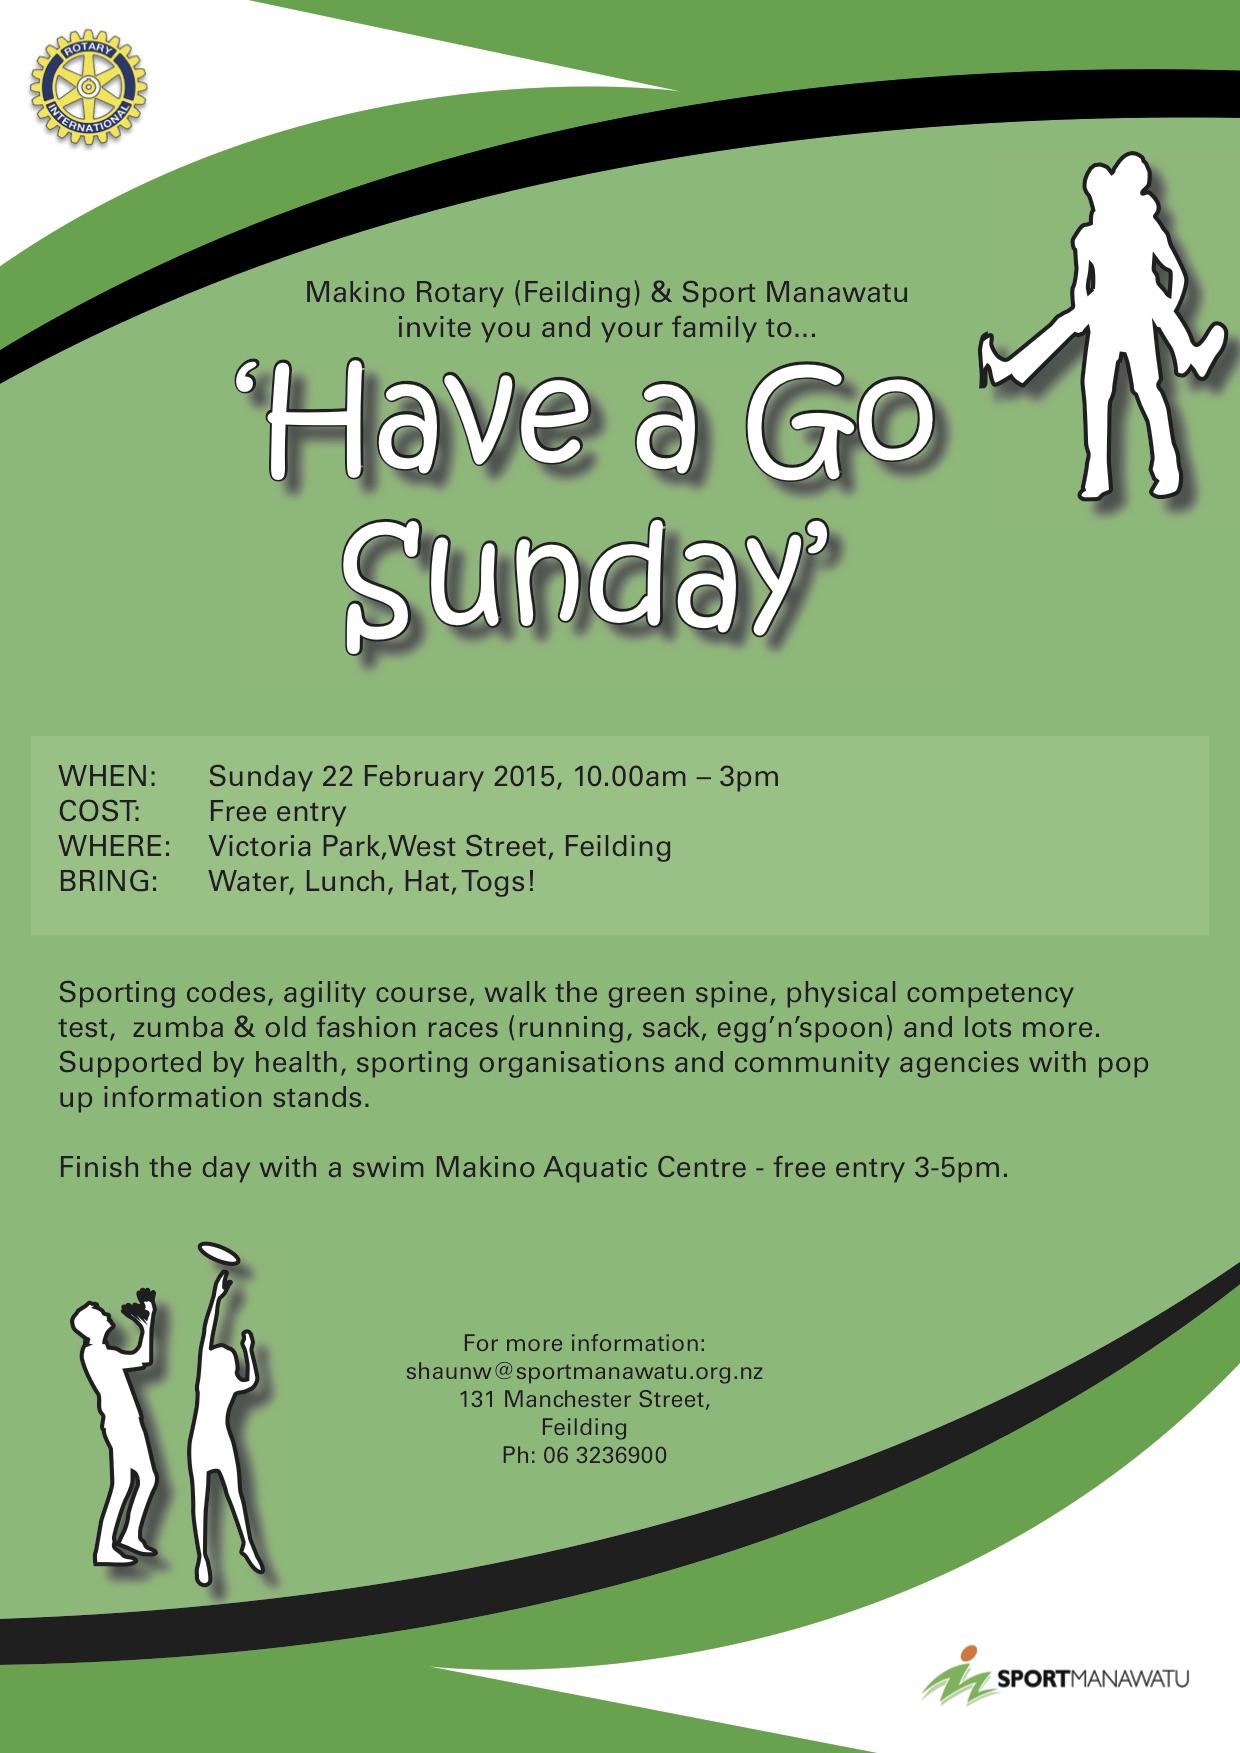 Have_A_Go_Sunday_Promotion_22_Feb_2015.jpg